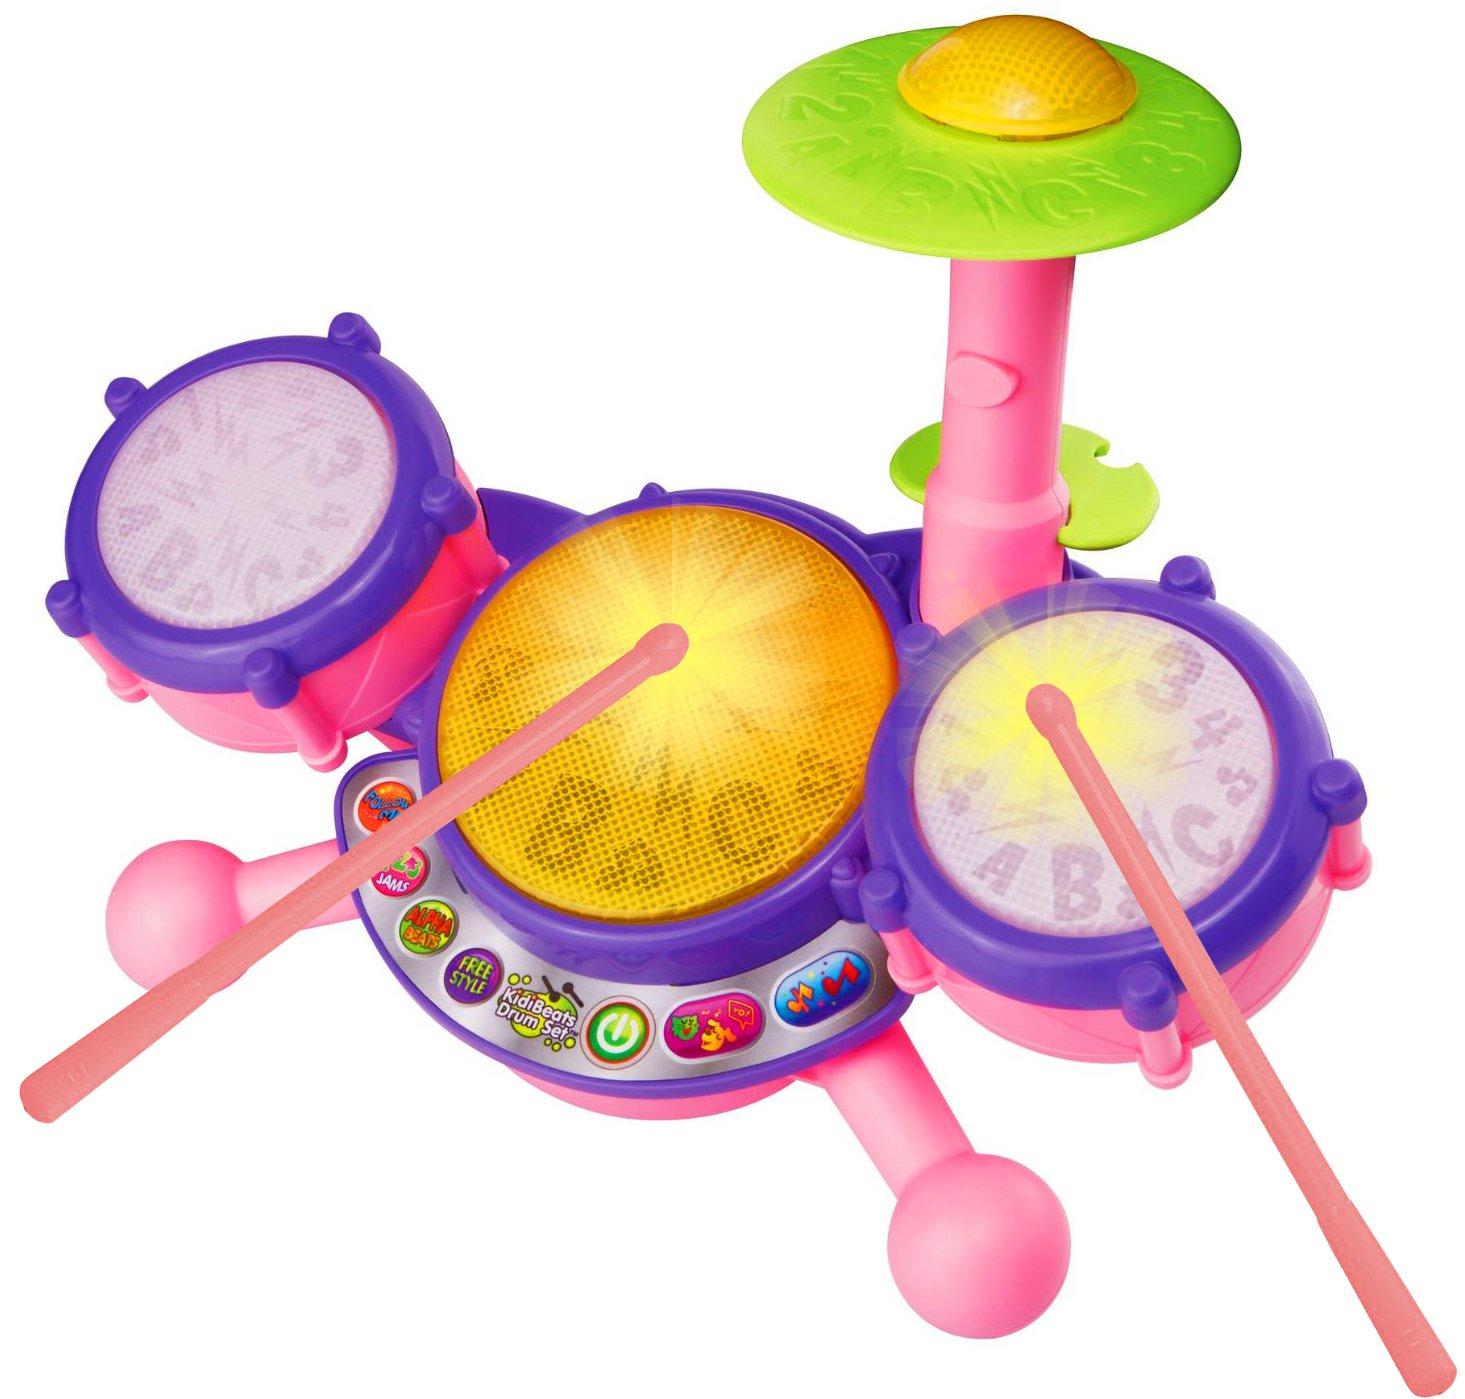 VTech KidiBeats Drum Set, Pink